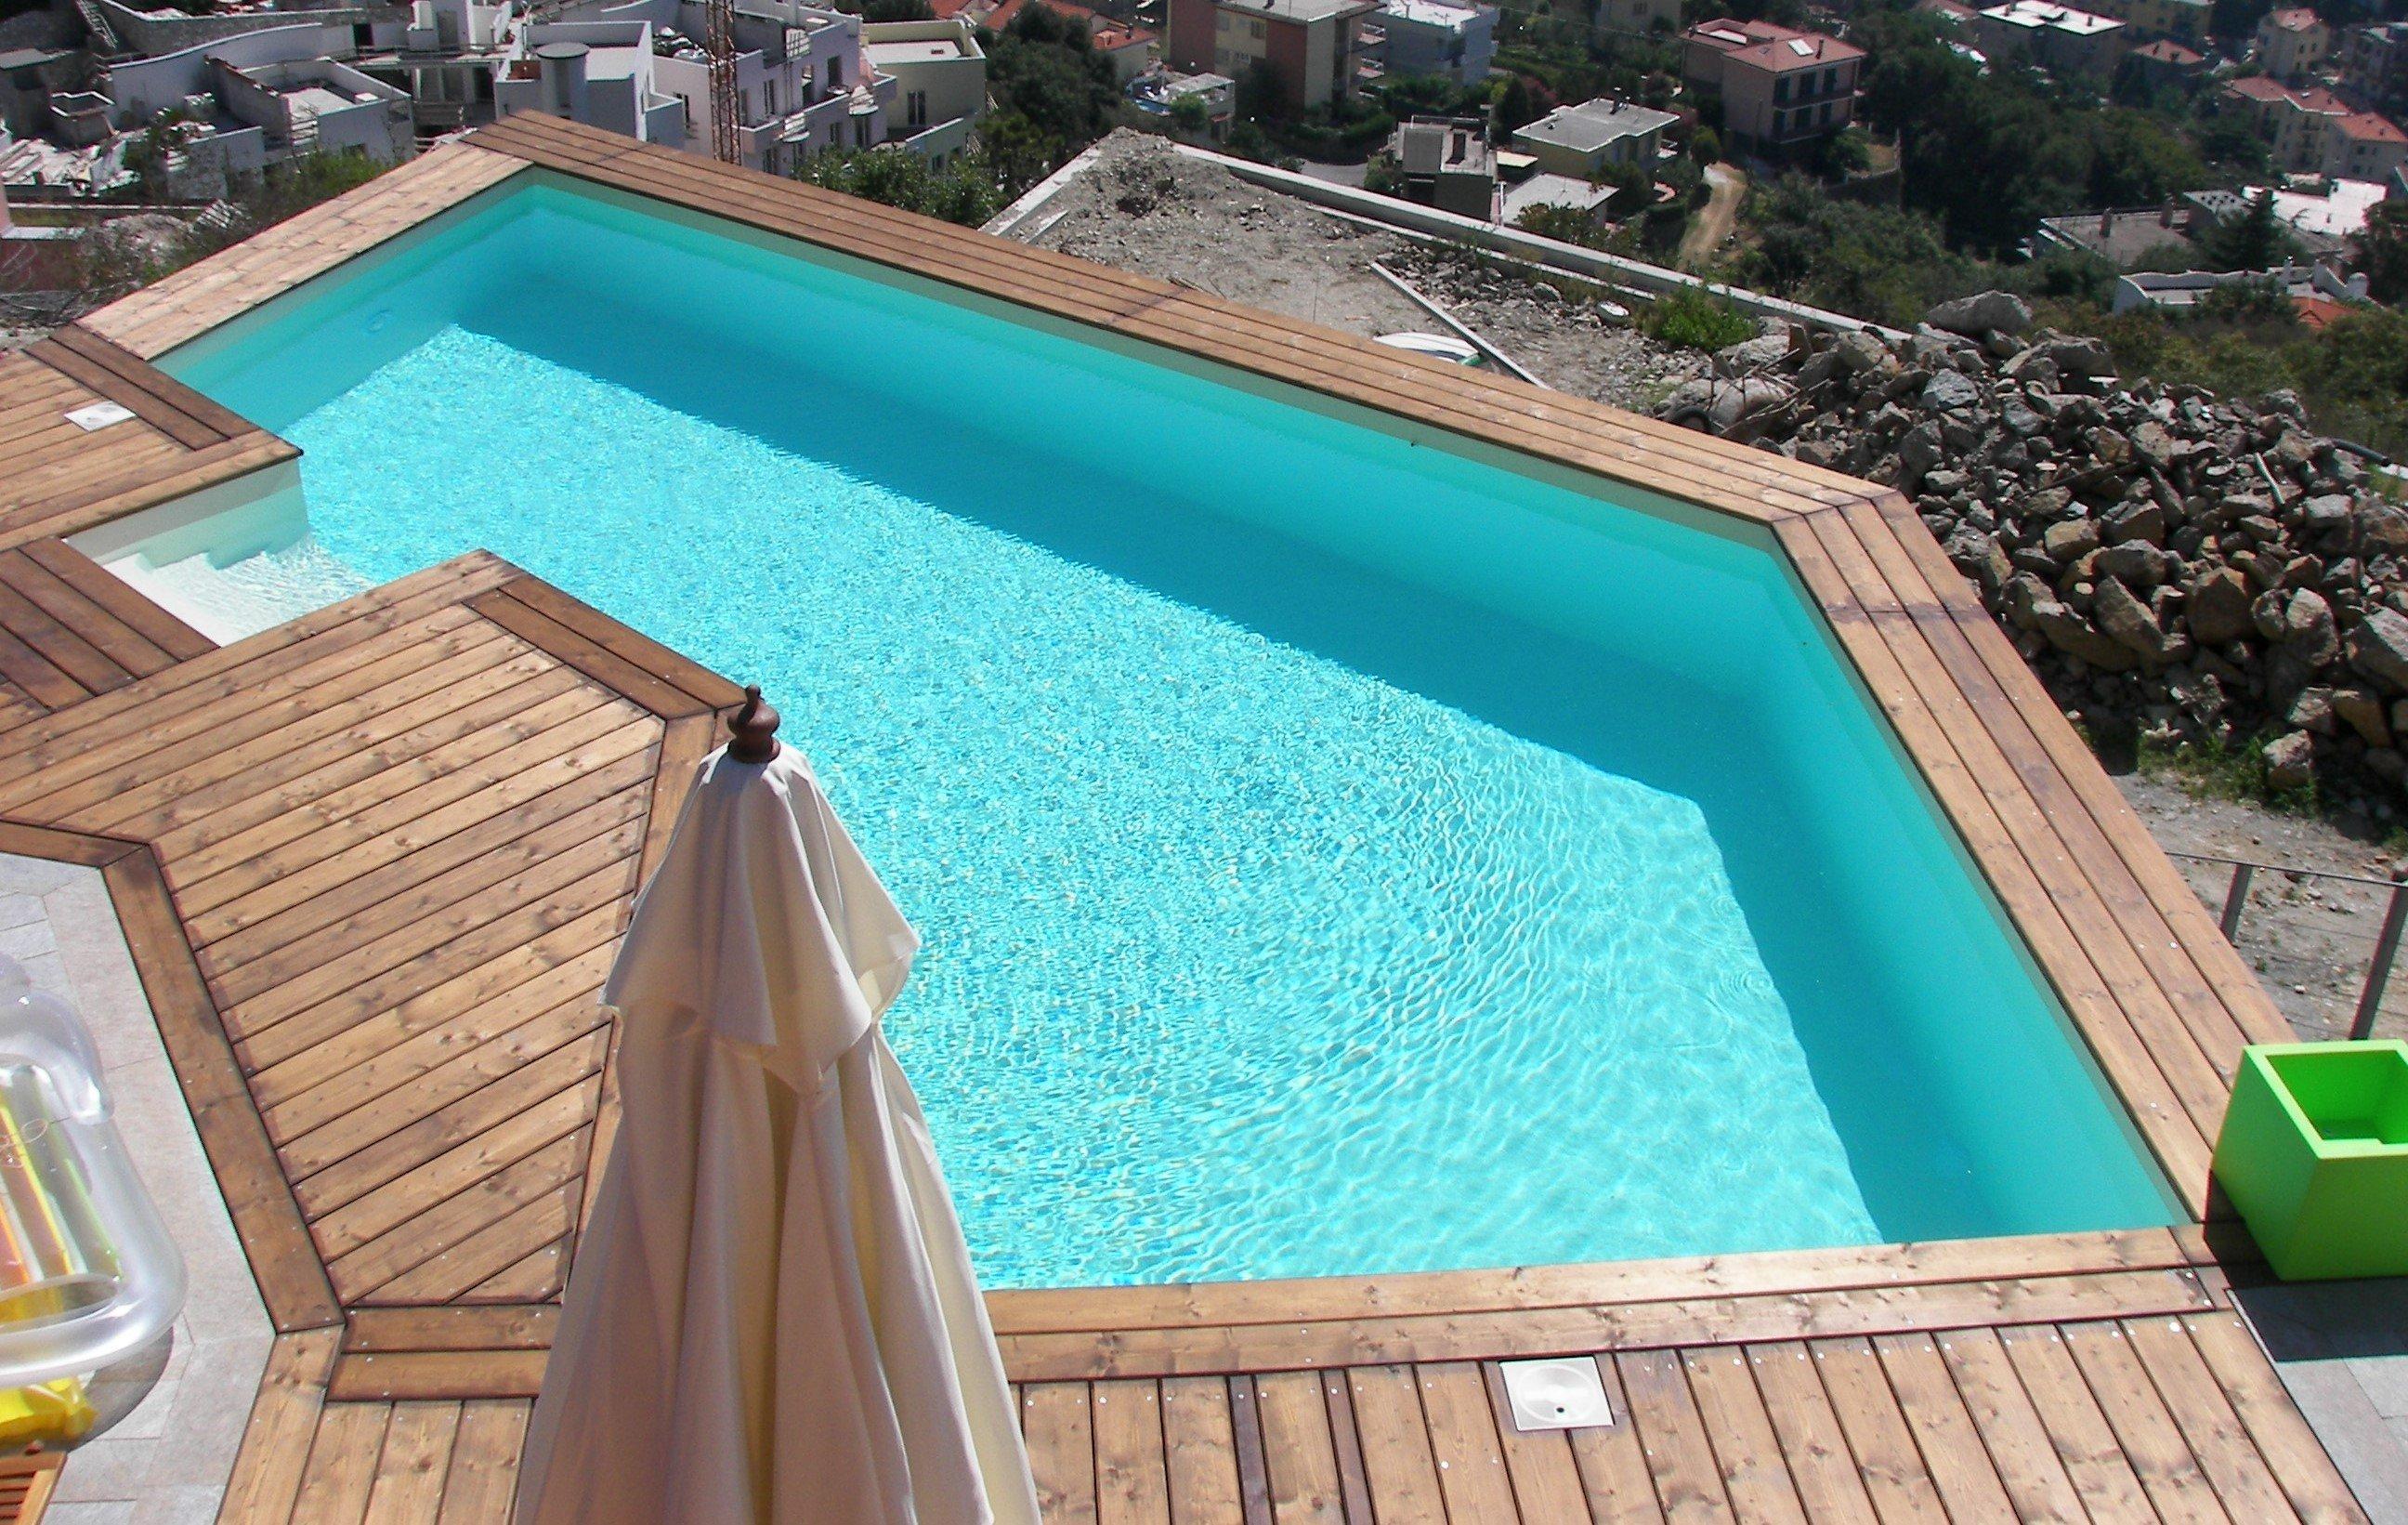 Gervasio piscine piscine e accessori savona sv for Riparare piscina